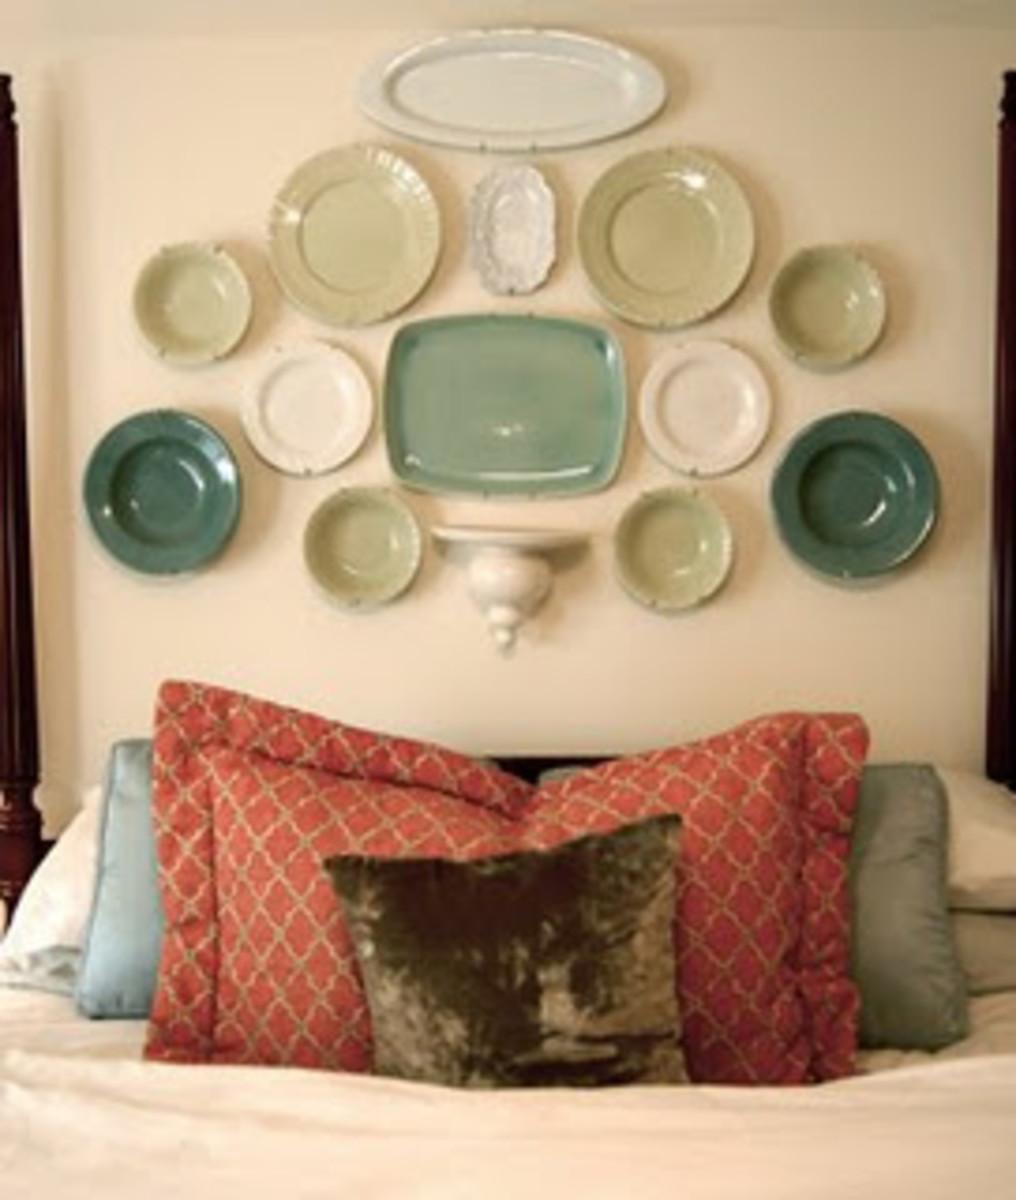 Headboard of Plates